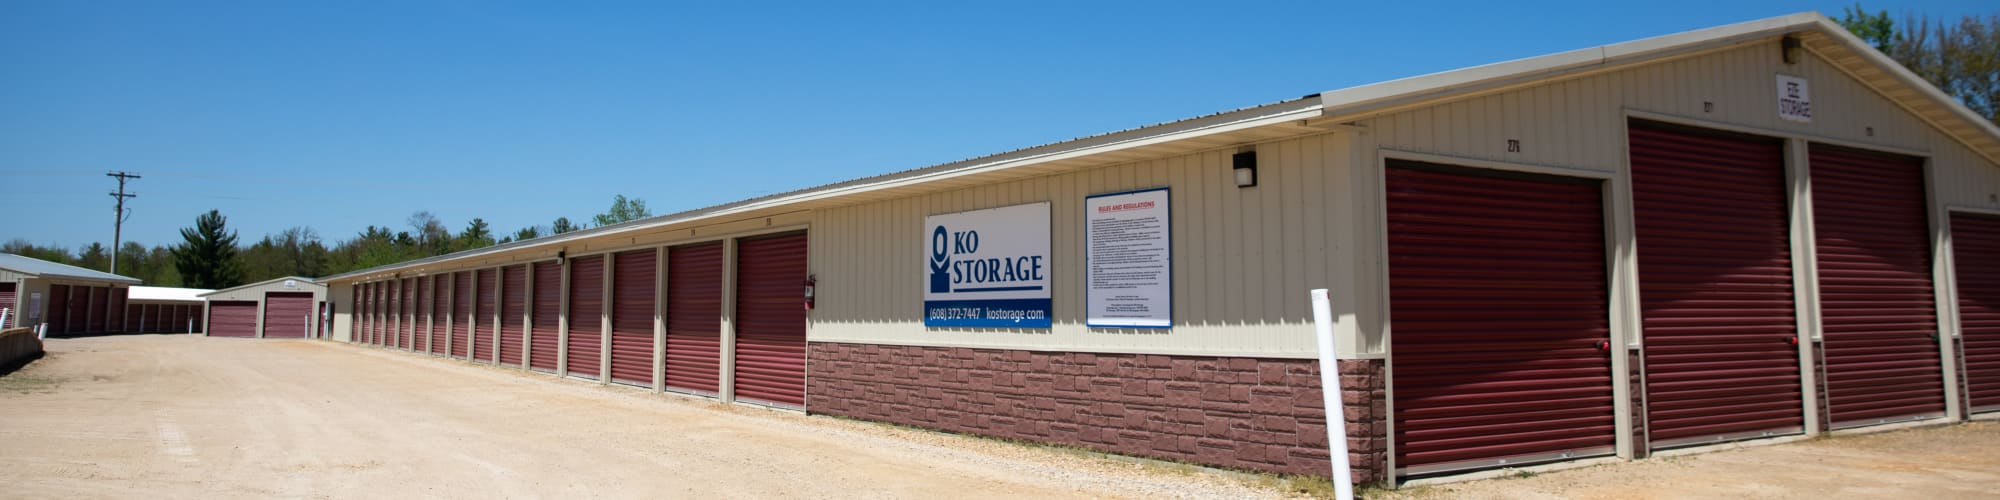 Self Storage in Tomah Wisconsin